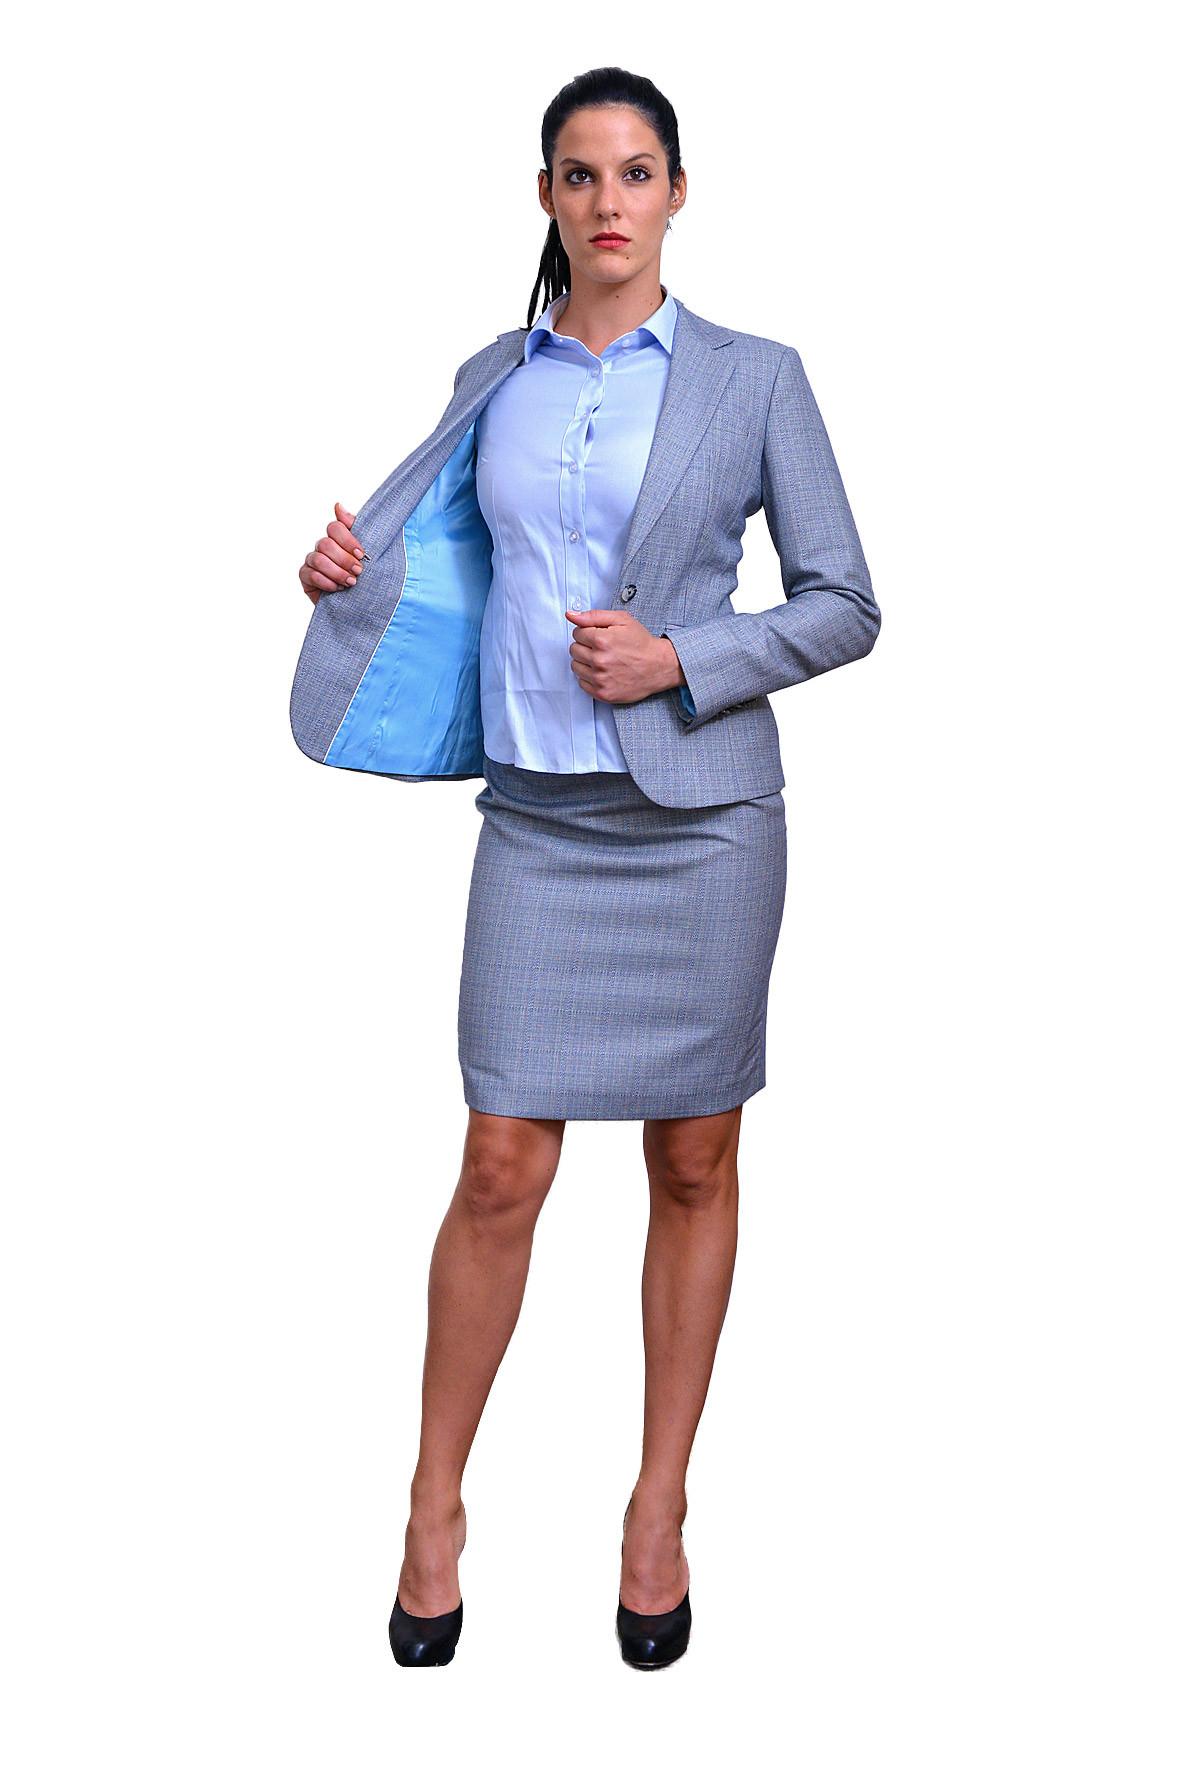 kleding voor kleine vrouwen